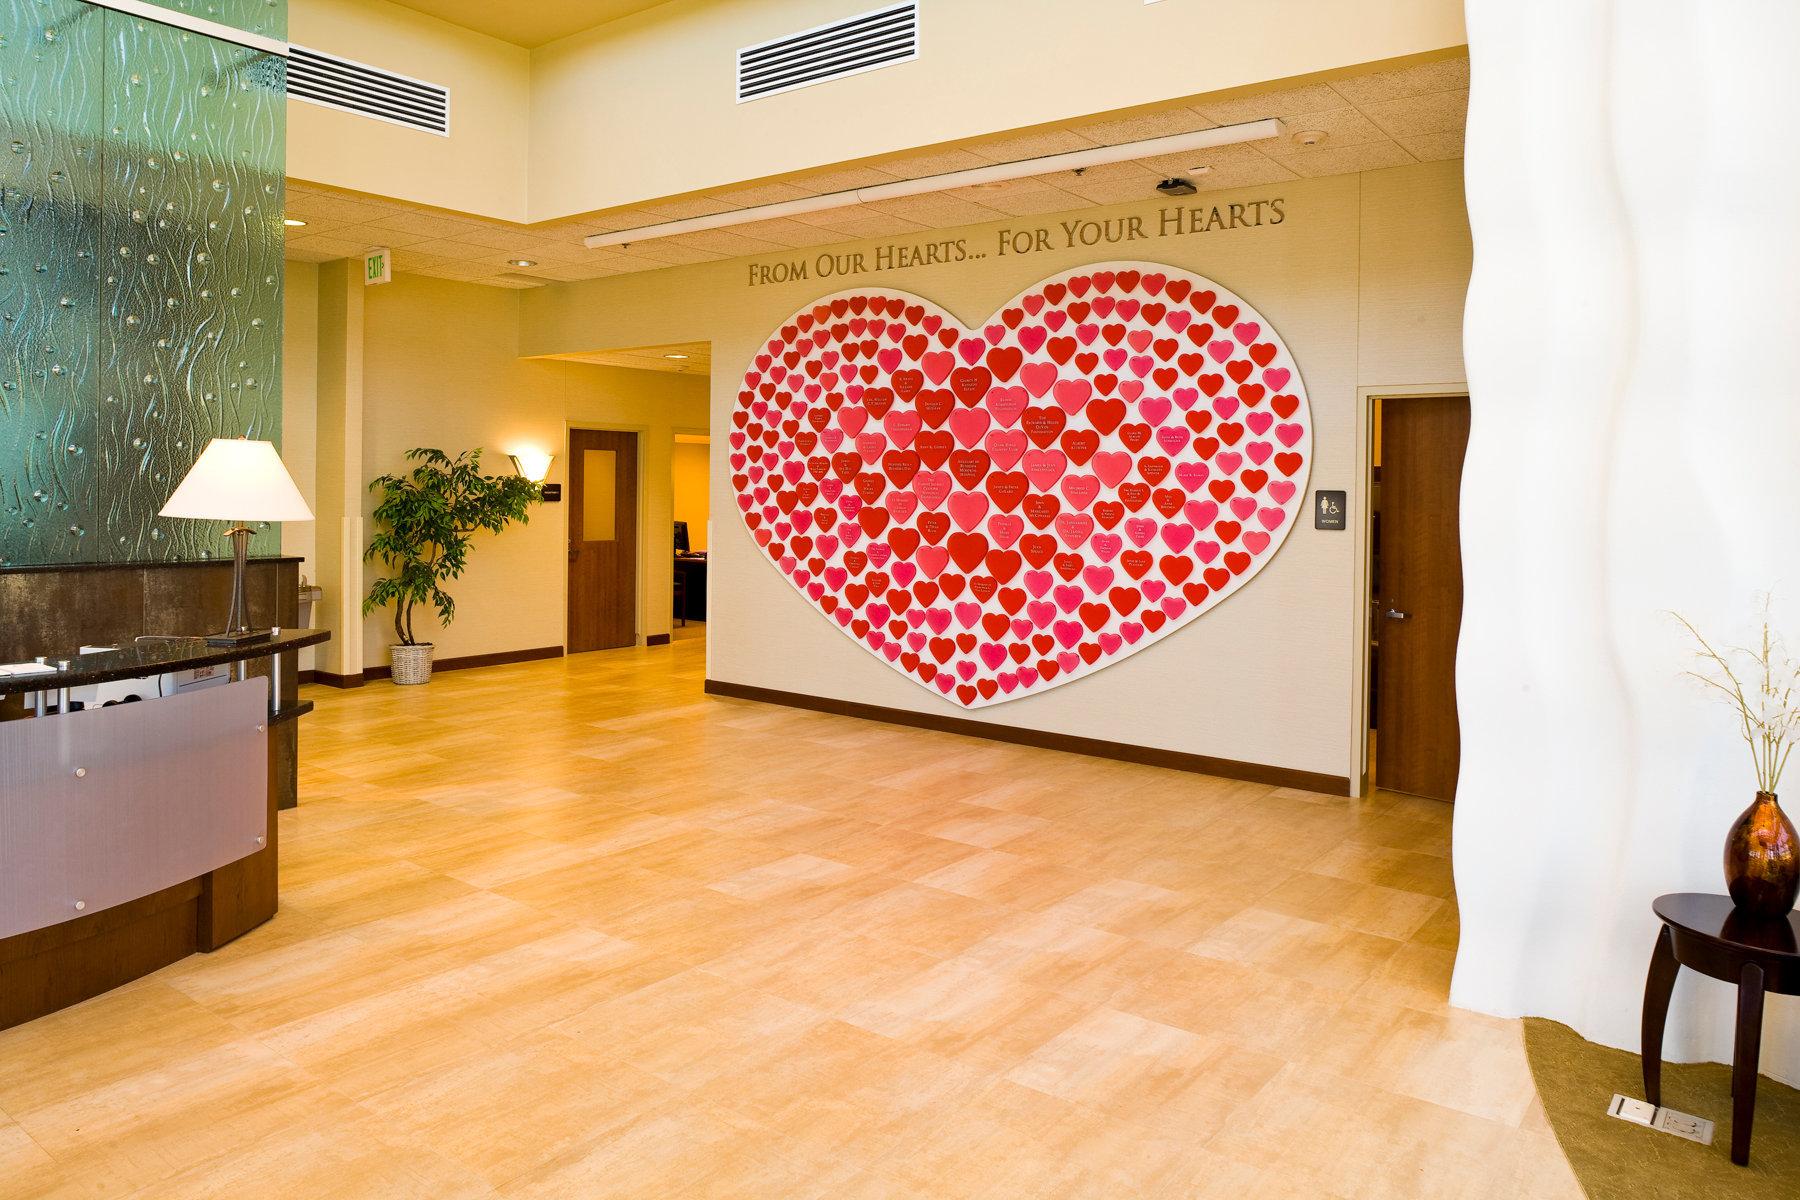 Bethesda Heart Hospital Wall of Honor